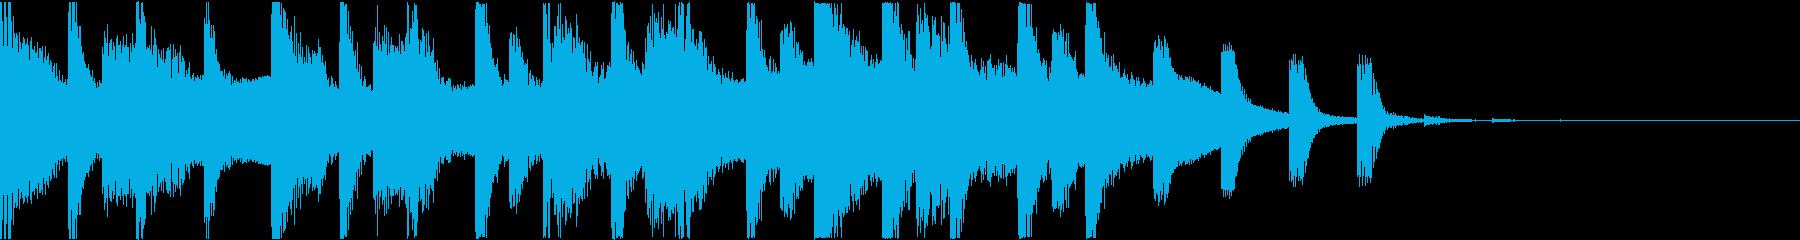 【CM用】電子ドラムとインド風メロディの再生済みの波形